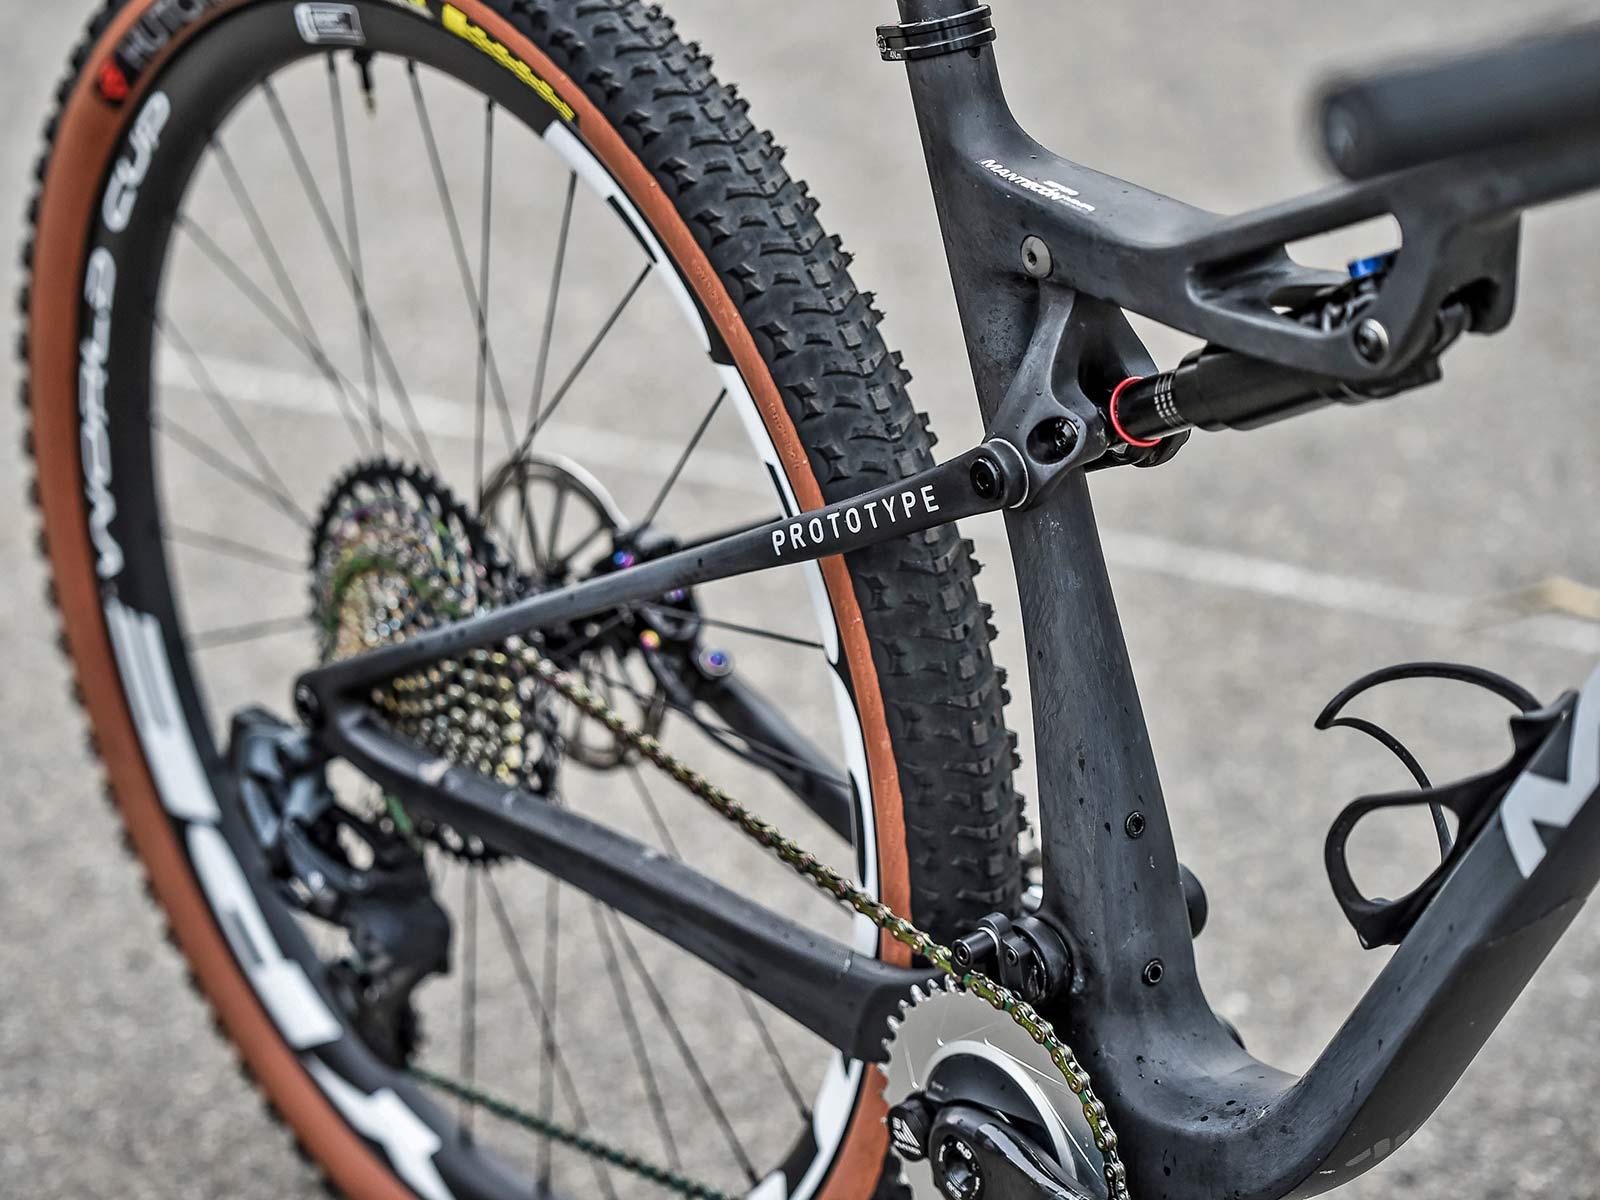 2021 MMR Kenta 29 prototype XC race bike, 100mm full-suspension carbon cross-country mountain bike, rear end